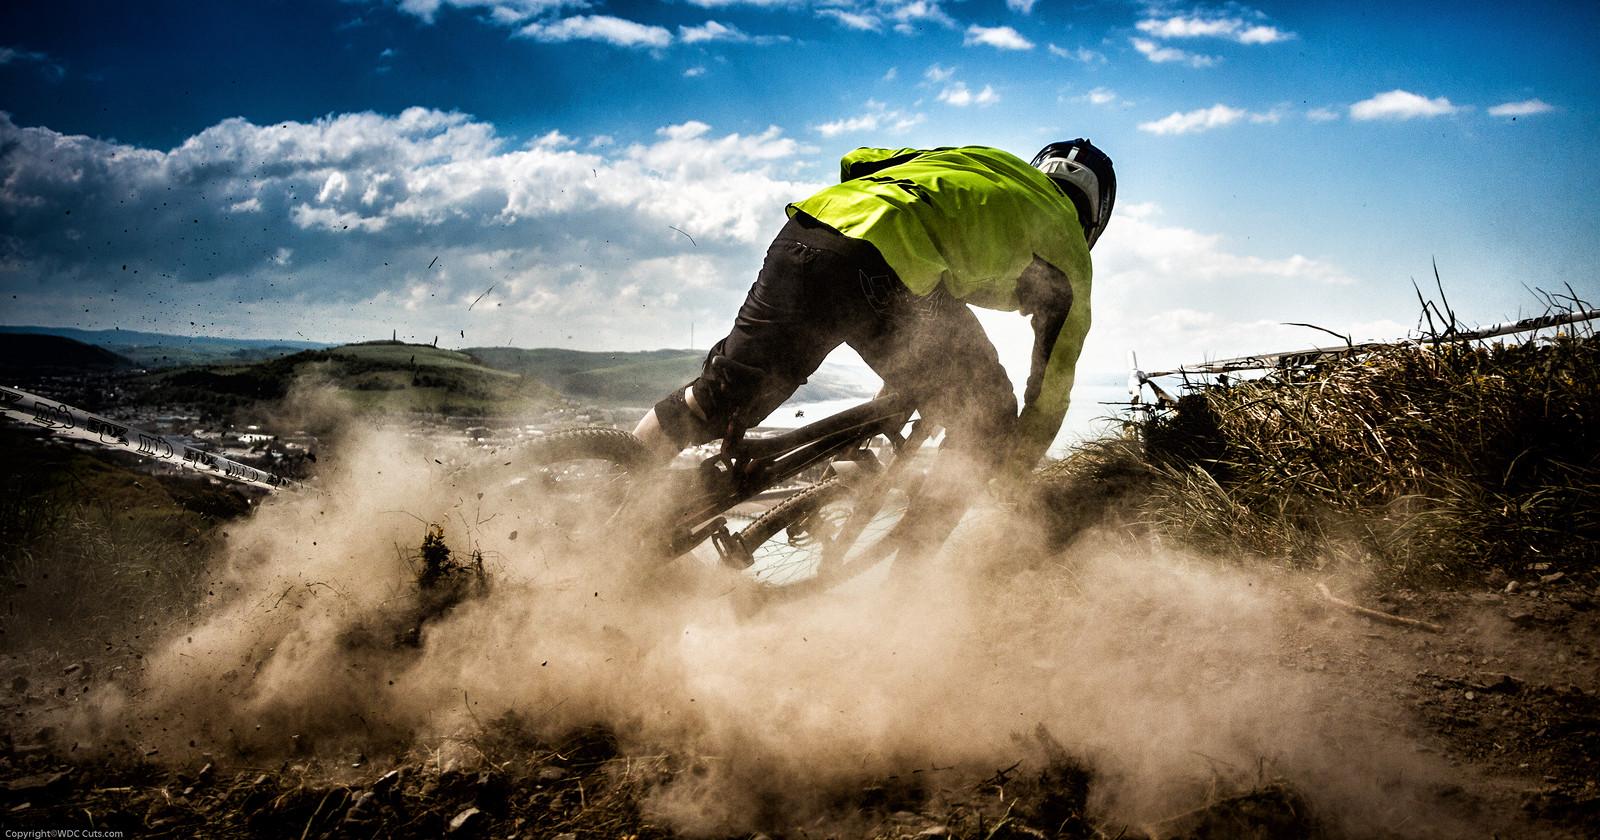 Roost - Wayne DC - Mountain Biking Pictures - Vital MTB